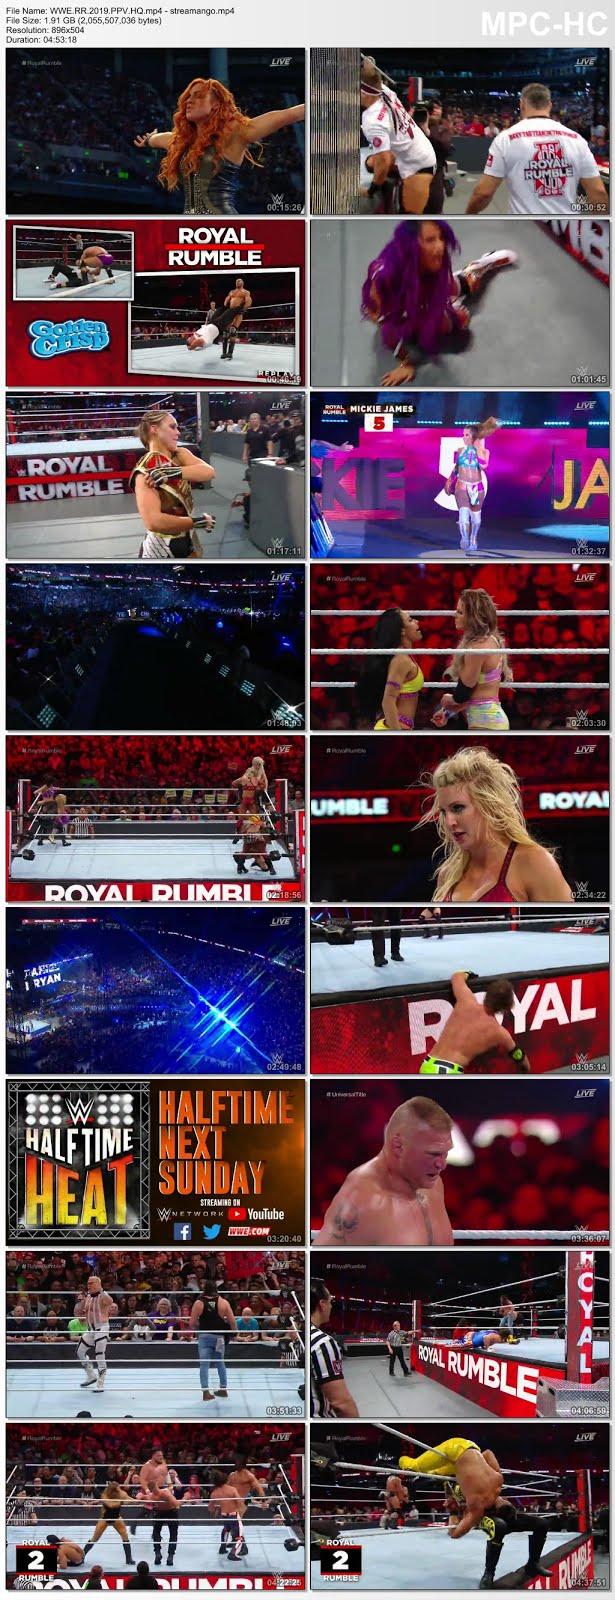 WWE Royal Rumble PPV 27 January 2019 720p HDTVRip x264 1.8GB Free Downlod